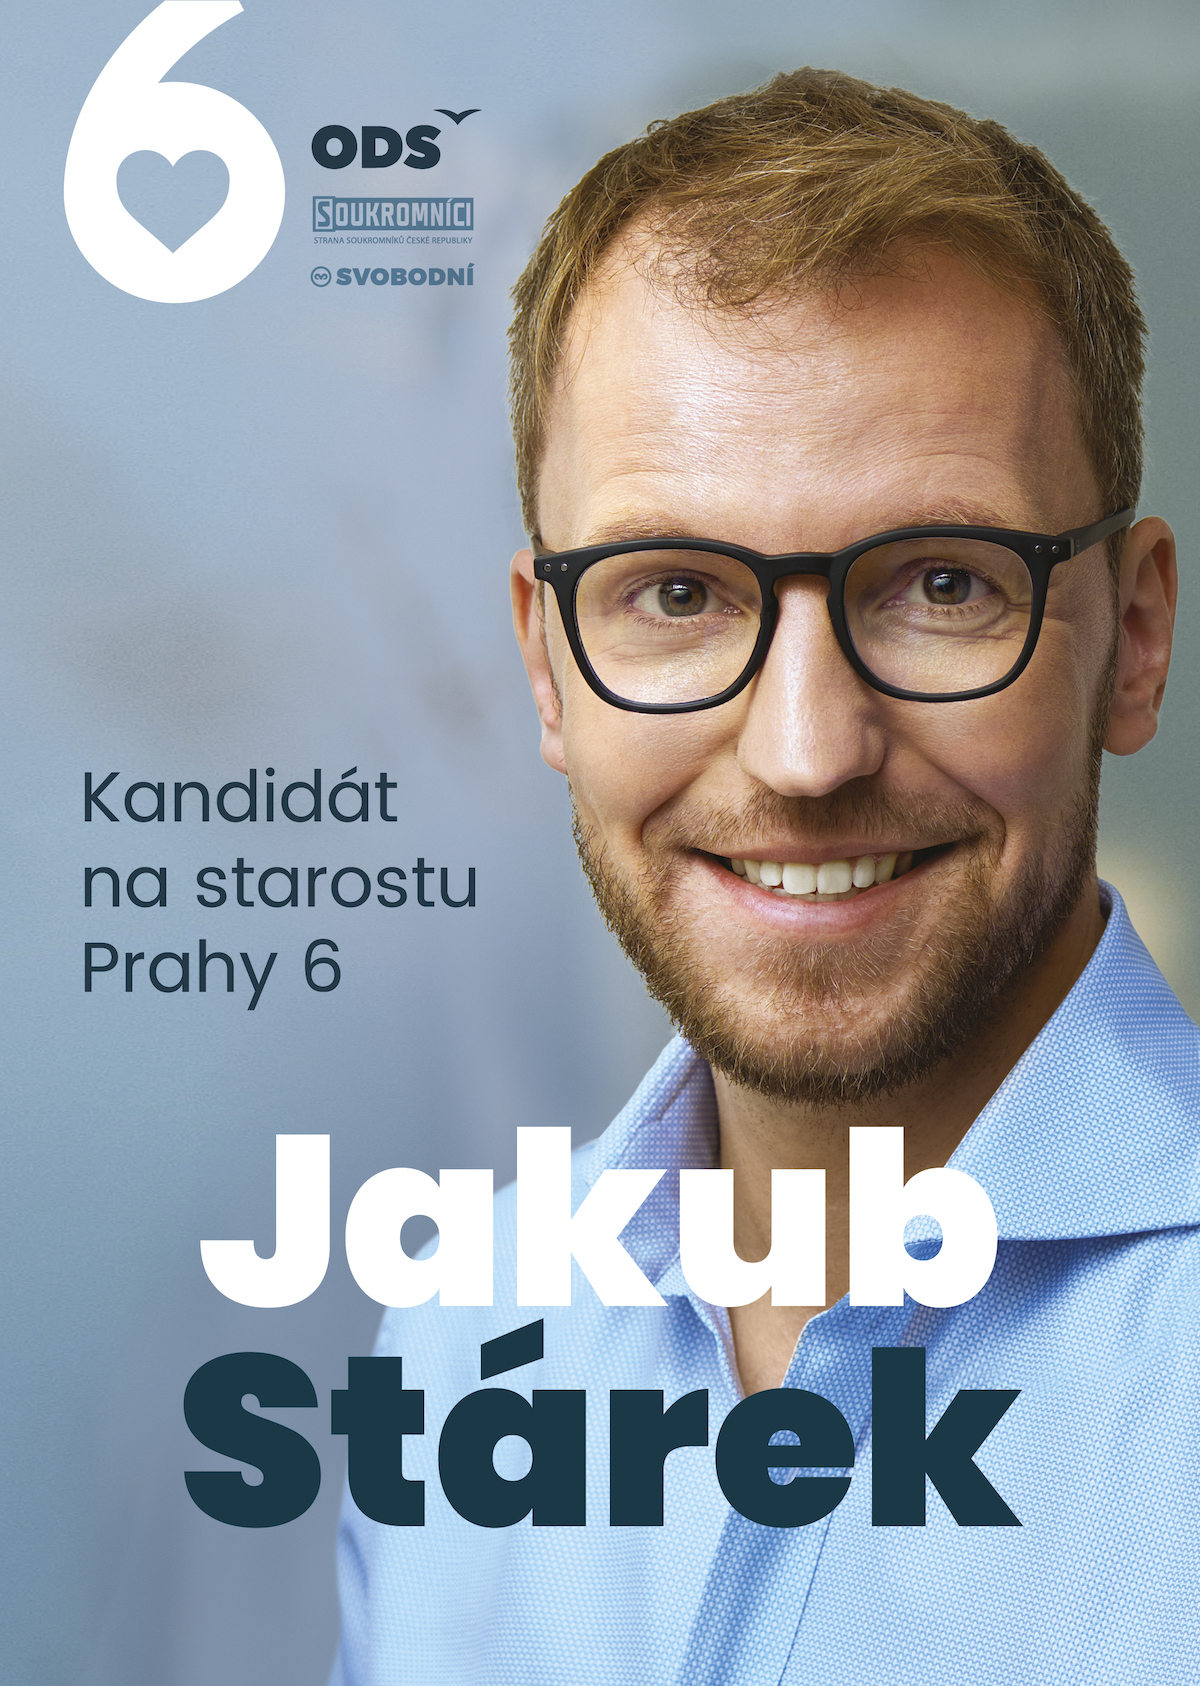 Jakub Stárek. kandidát na starostu Prahy 6